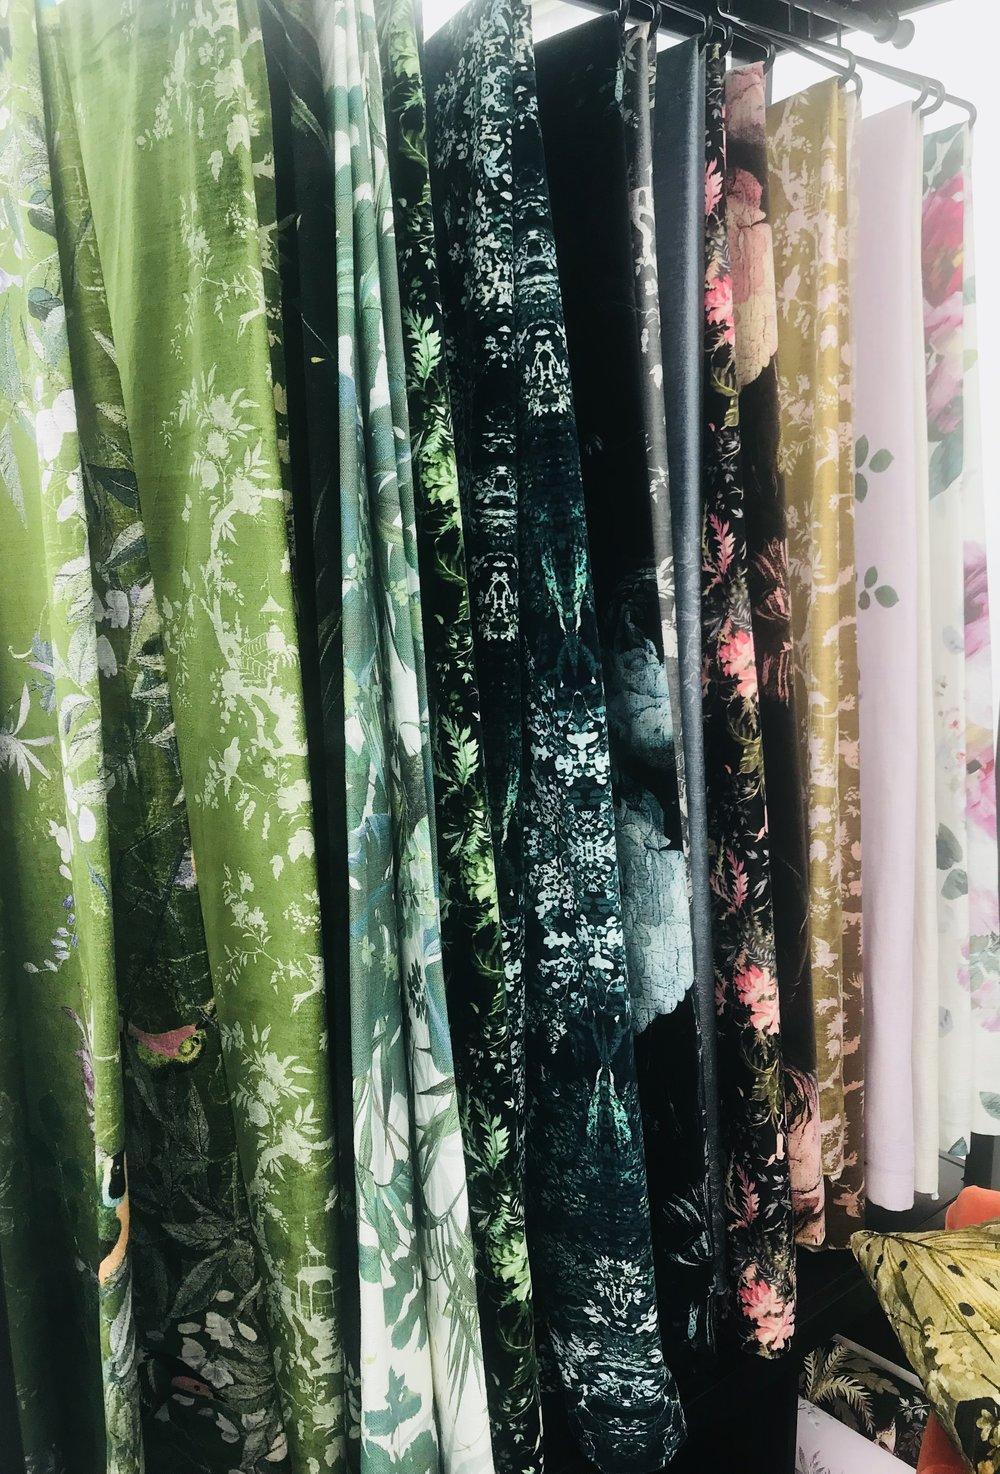 decorex-angel-and-boho-textiles-interior-design-lauraloves-design.jpg